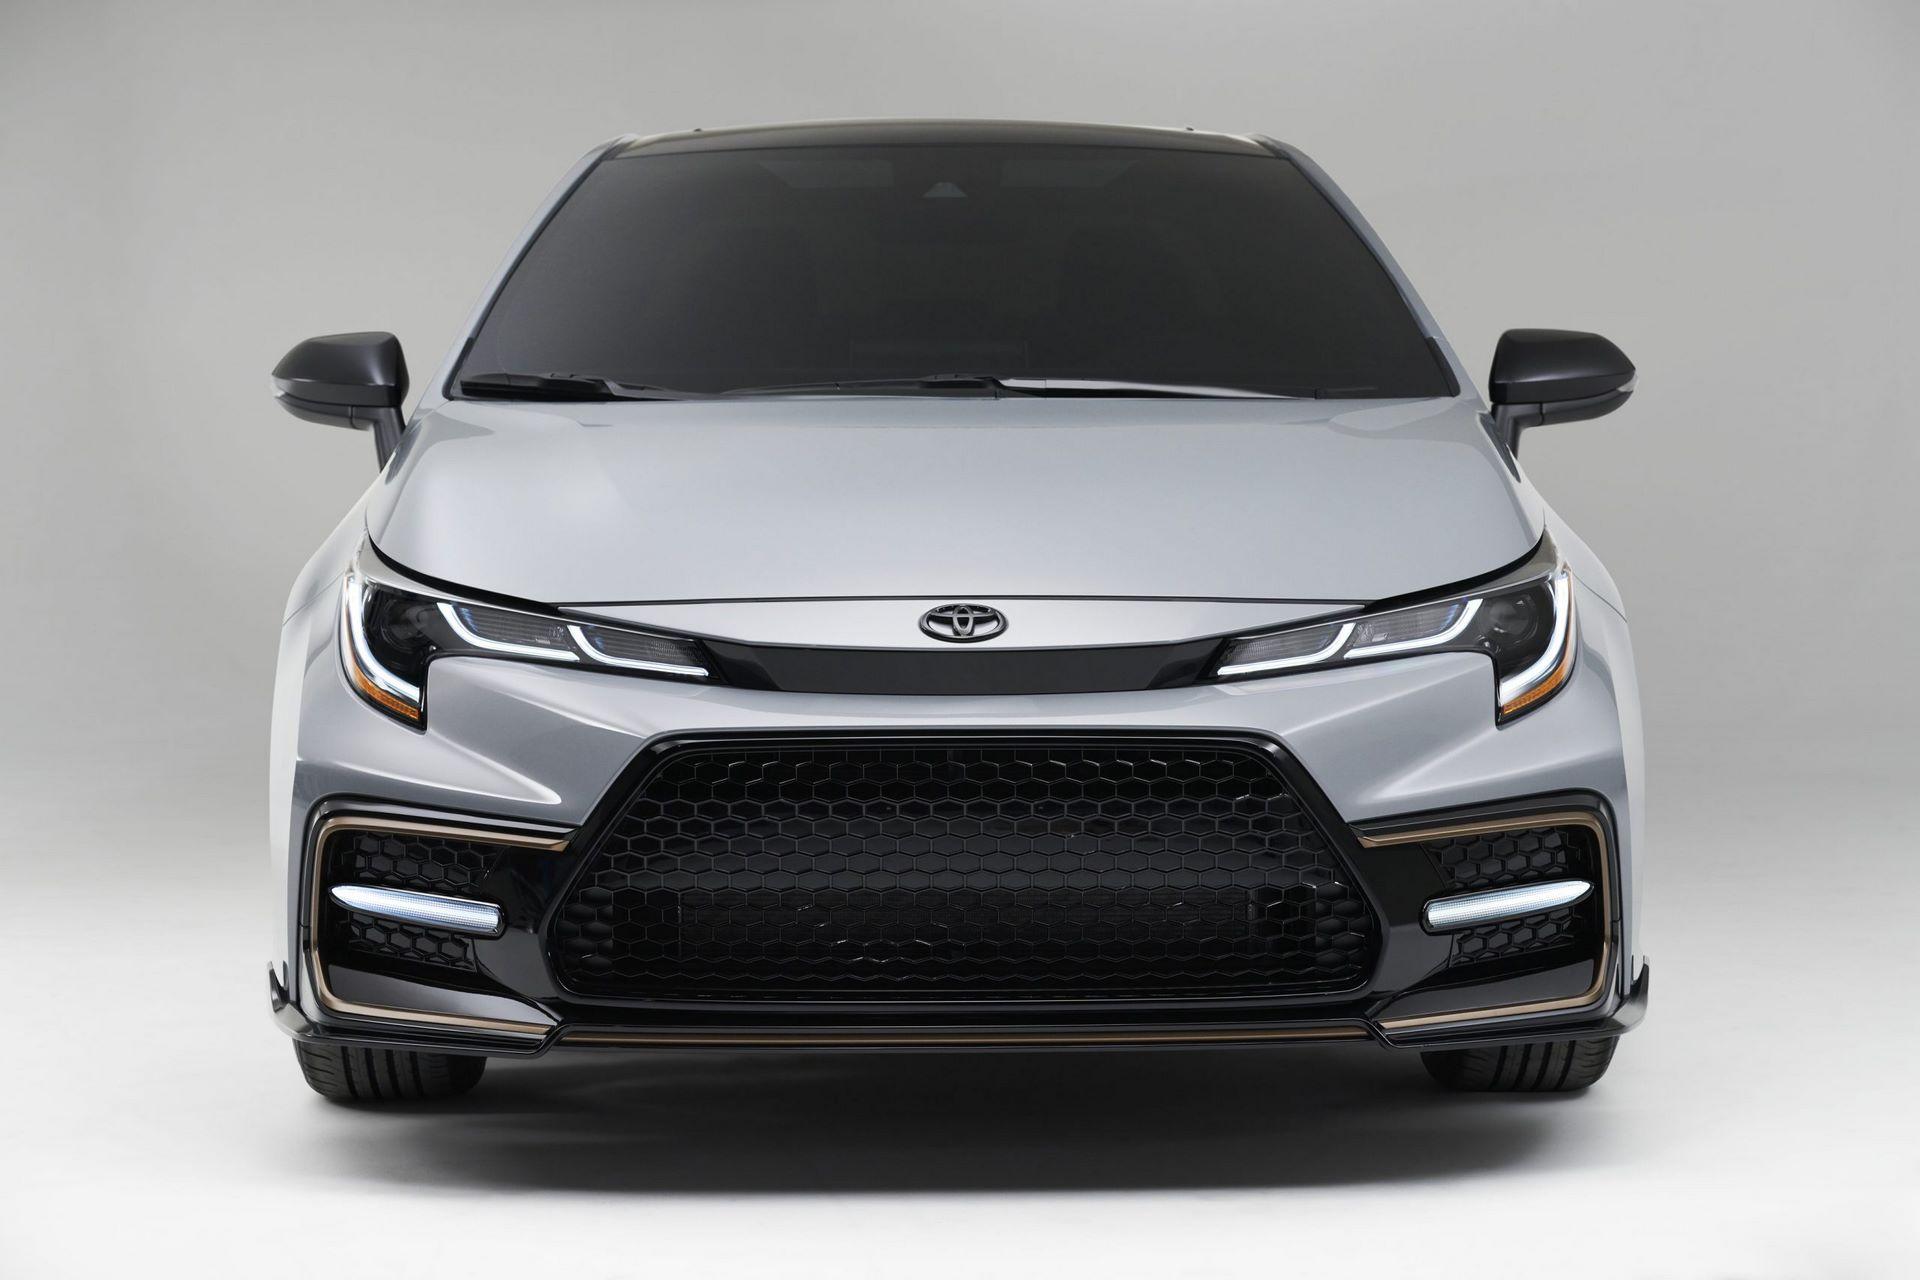 2021-Toyota-Corolla-Apex_002-scaled